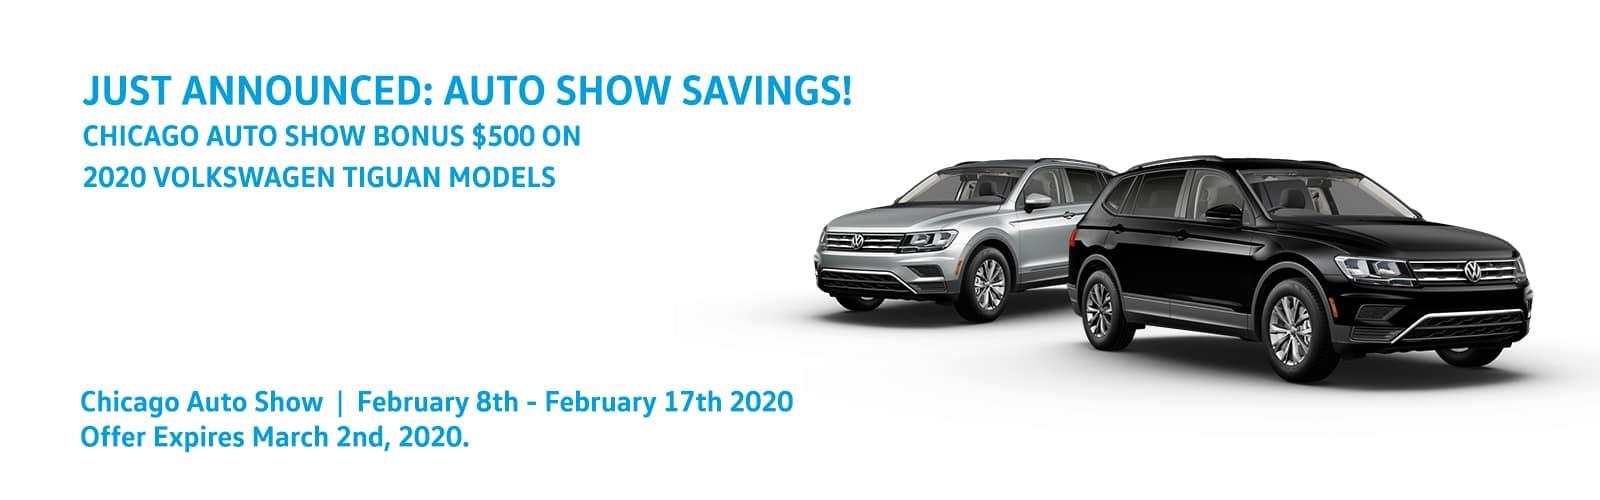 Chicago Auto Show-$500 Bonus on Volkswagen Tiguan